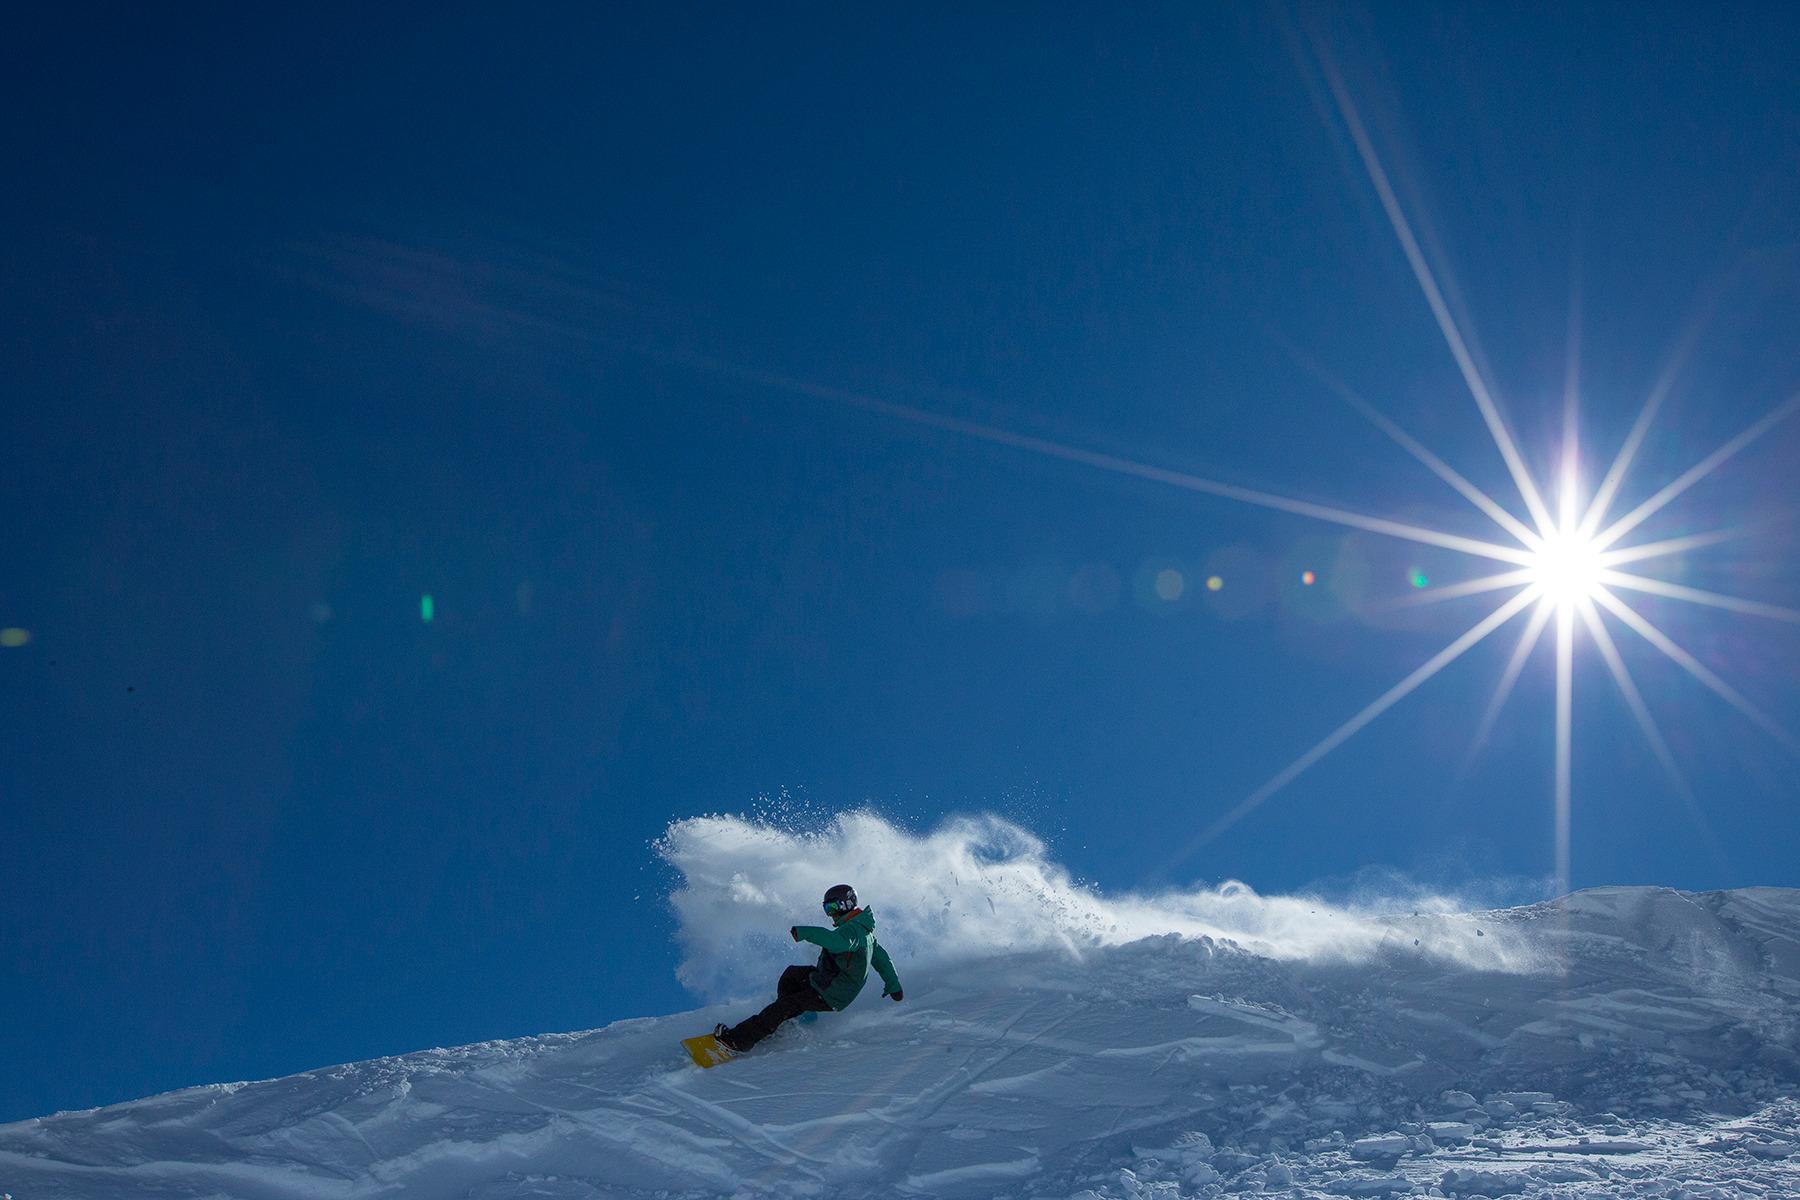 Beginners snowbound for Tūroa's opening weekend despite light fall